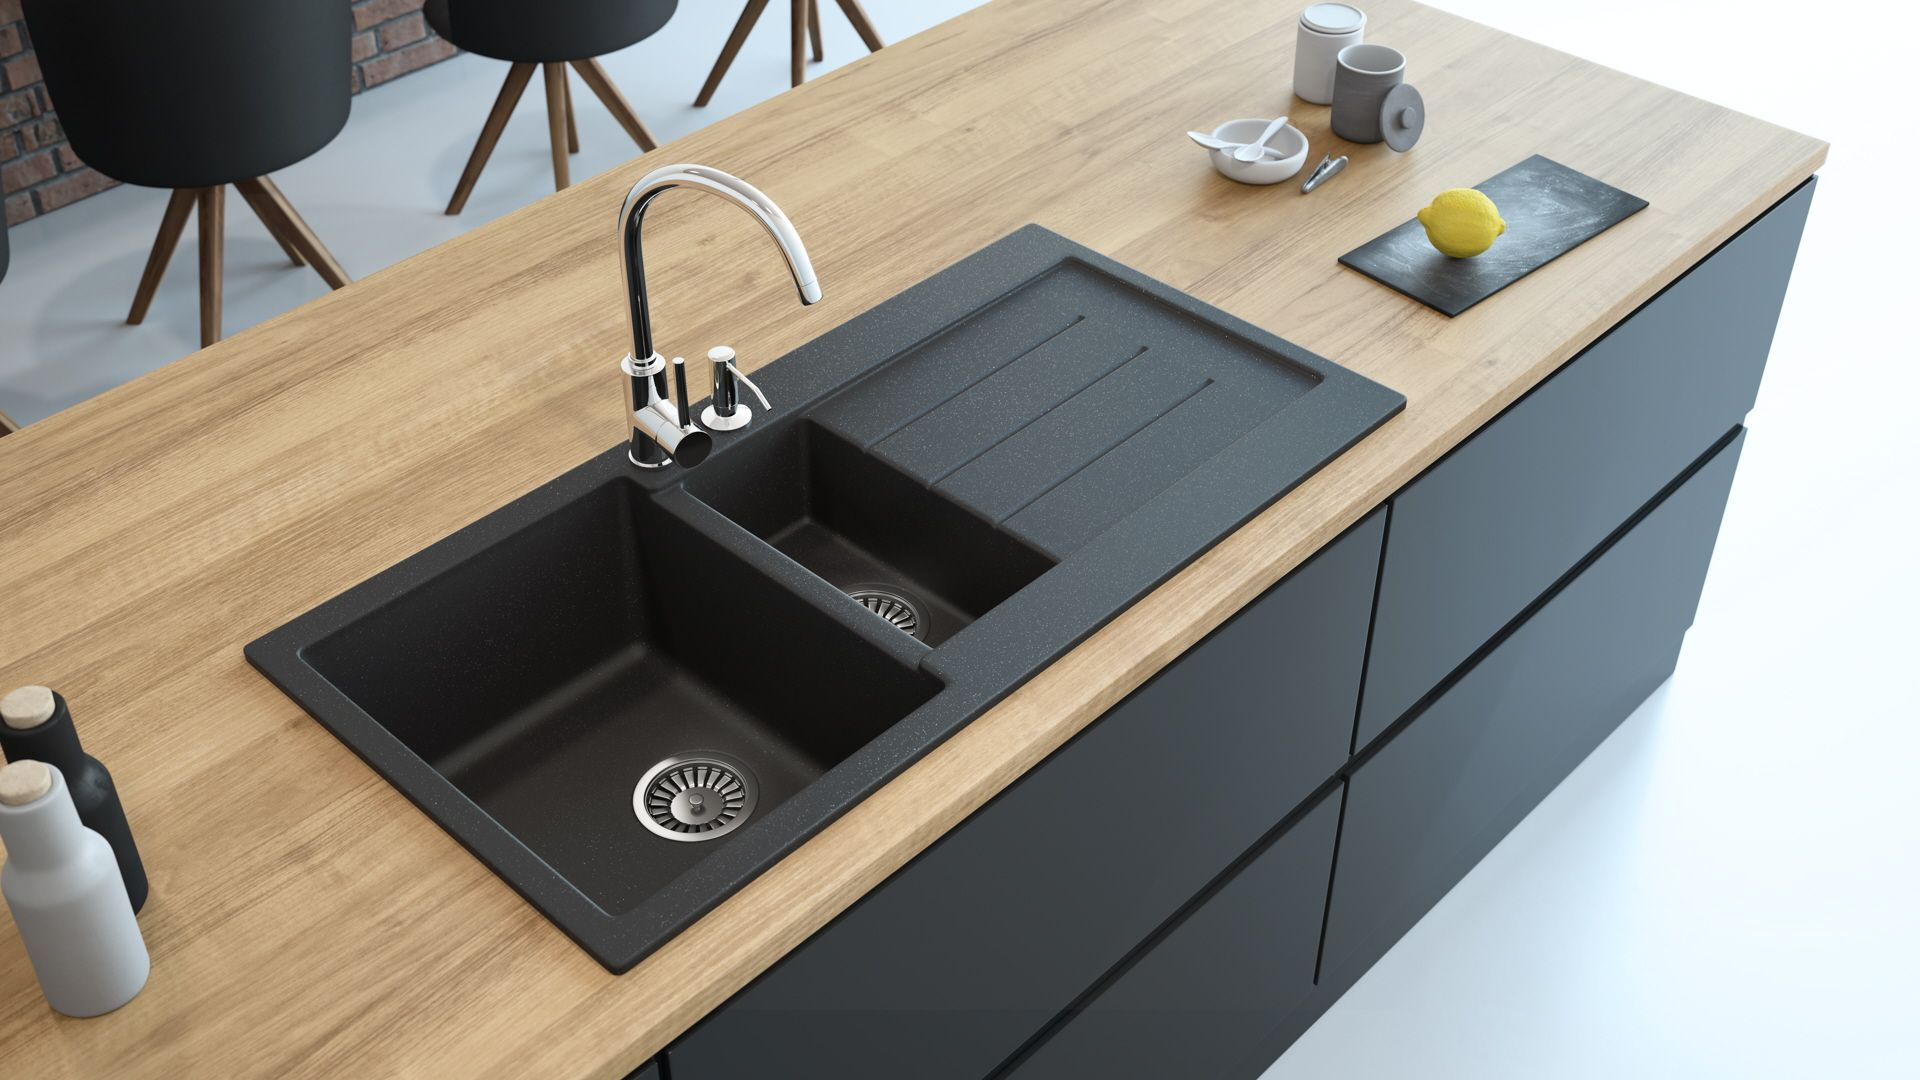 39 Granite Composite Drop In Double Bowl Kitchen Sink With Drainboard Lavello Decoro 150lt Lavello Sinks Double Bowl Kitchen Sink Drainboard Sink Granite Kitchen Sinks